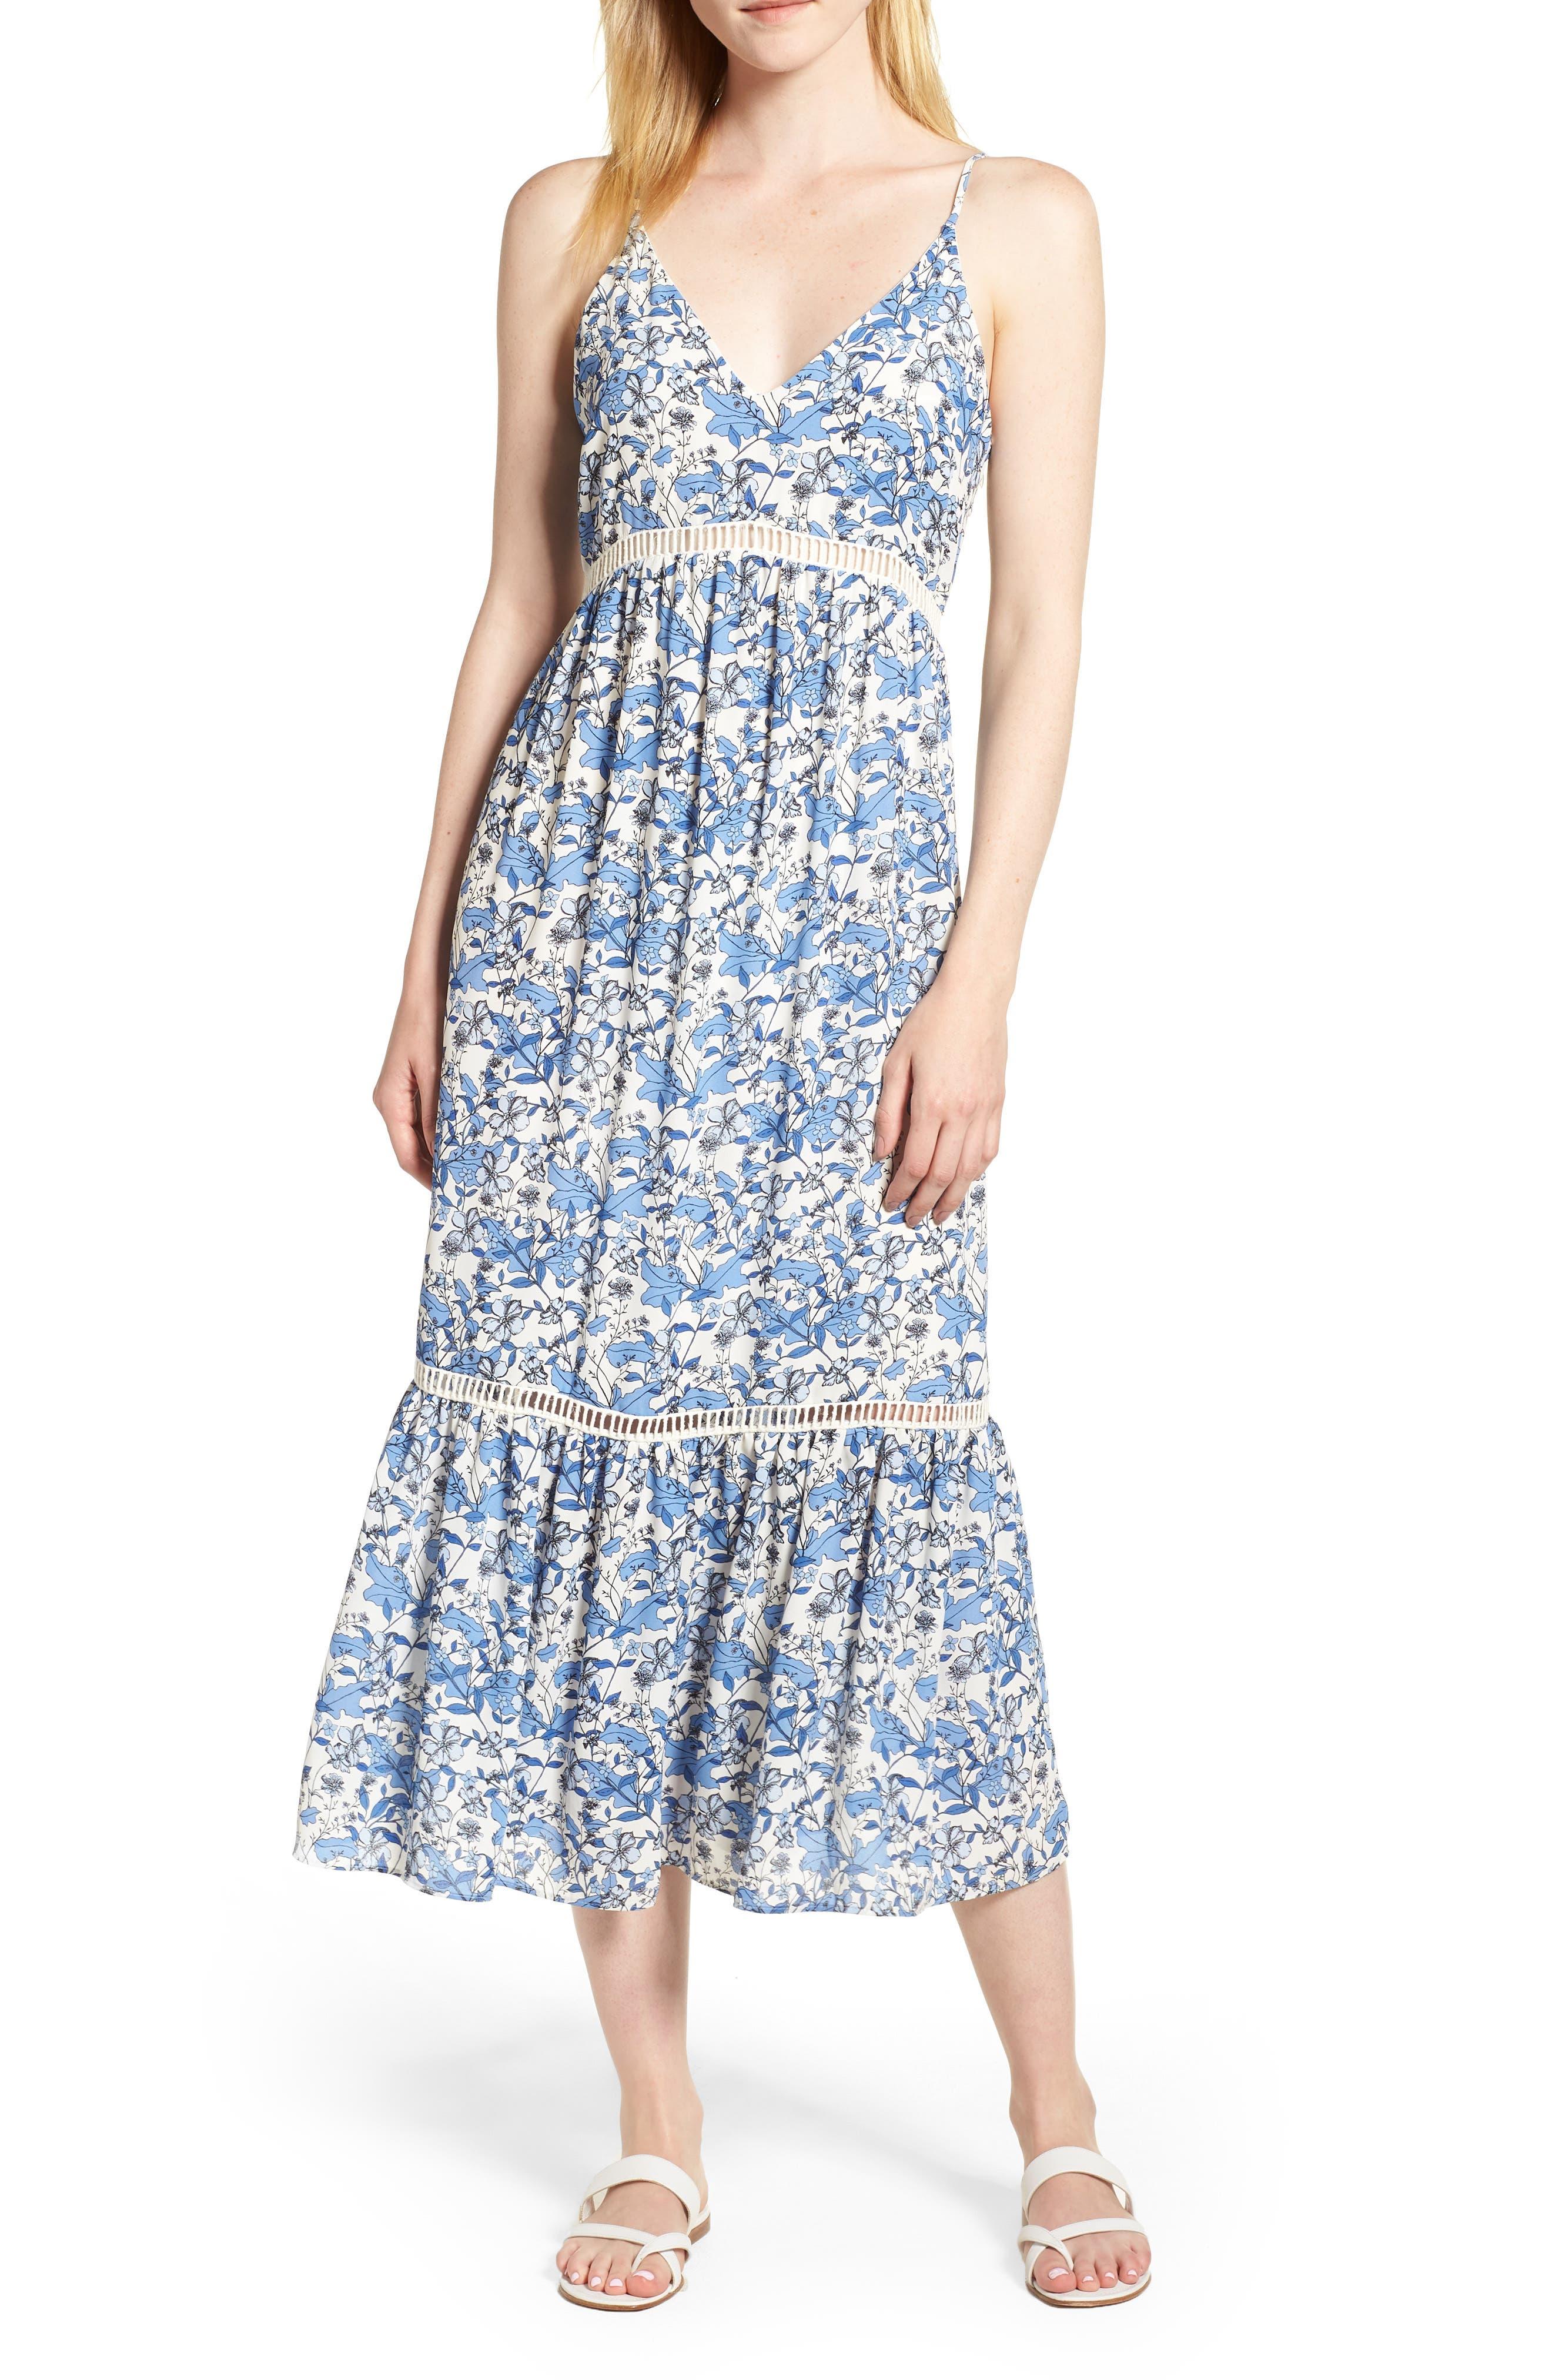 Ivy Forest Maxi Dress,                             Main thumbnail 1, color,                             Antique White